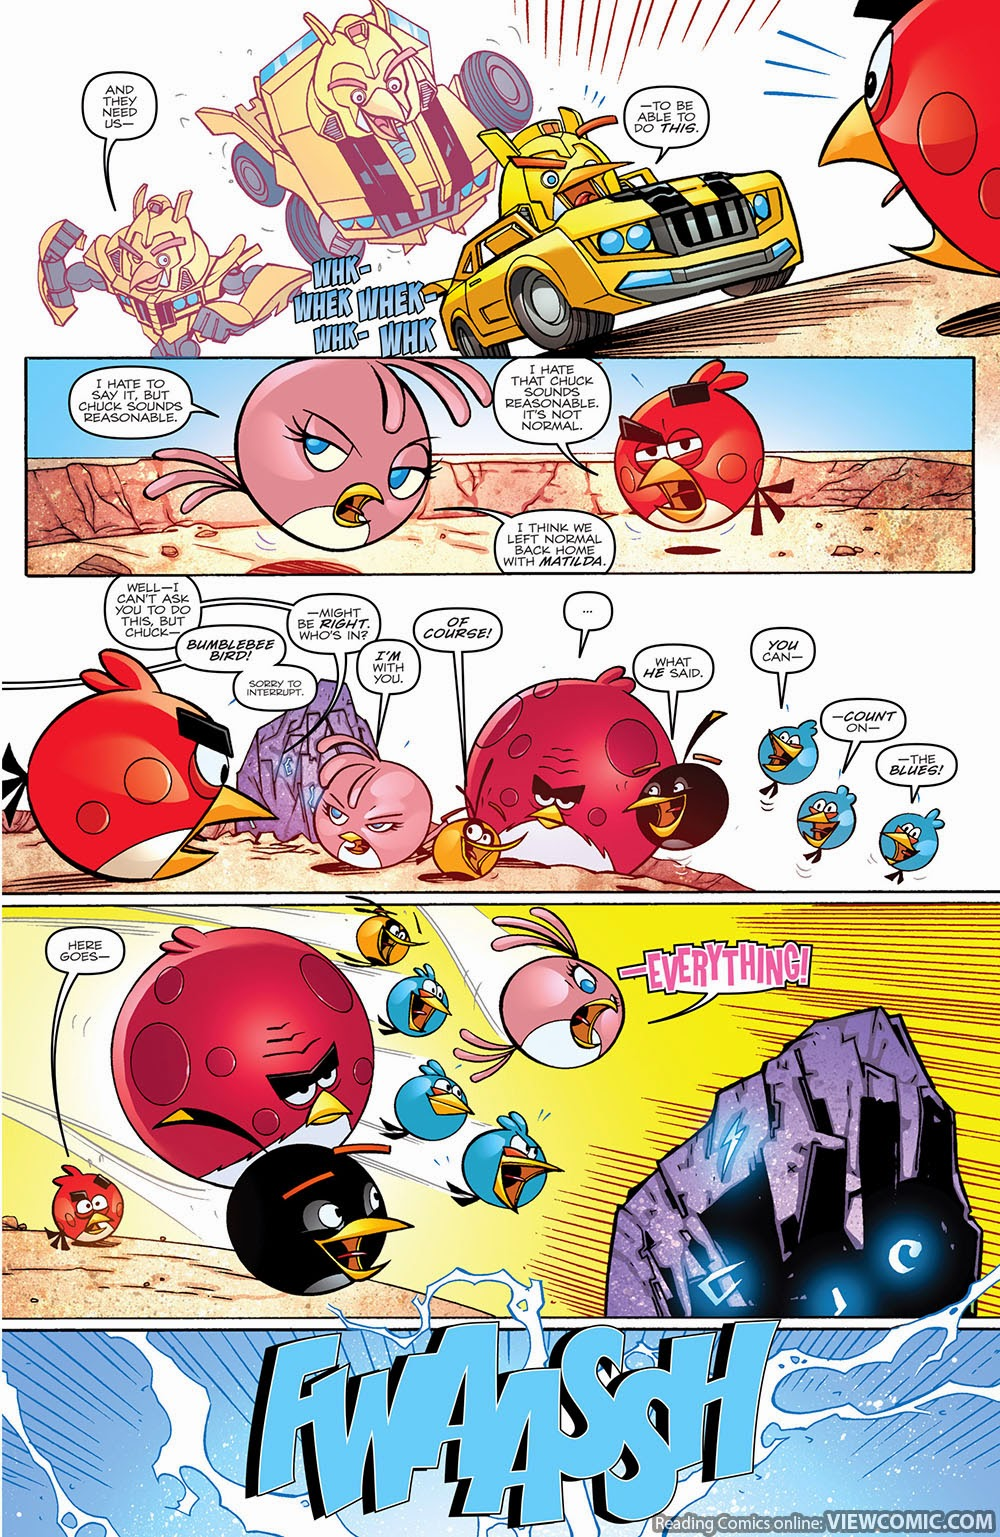 angry birds transformers 002 2014 u2026 u2026 u2026 u2026 viewcomic reading